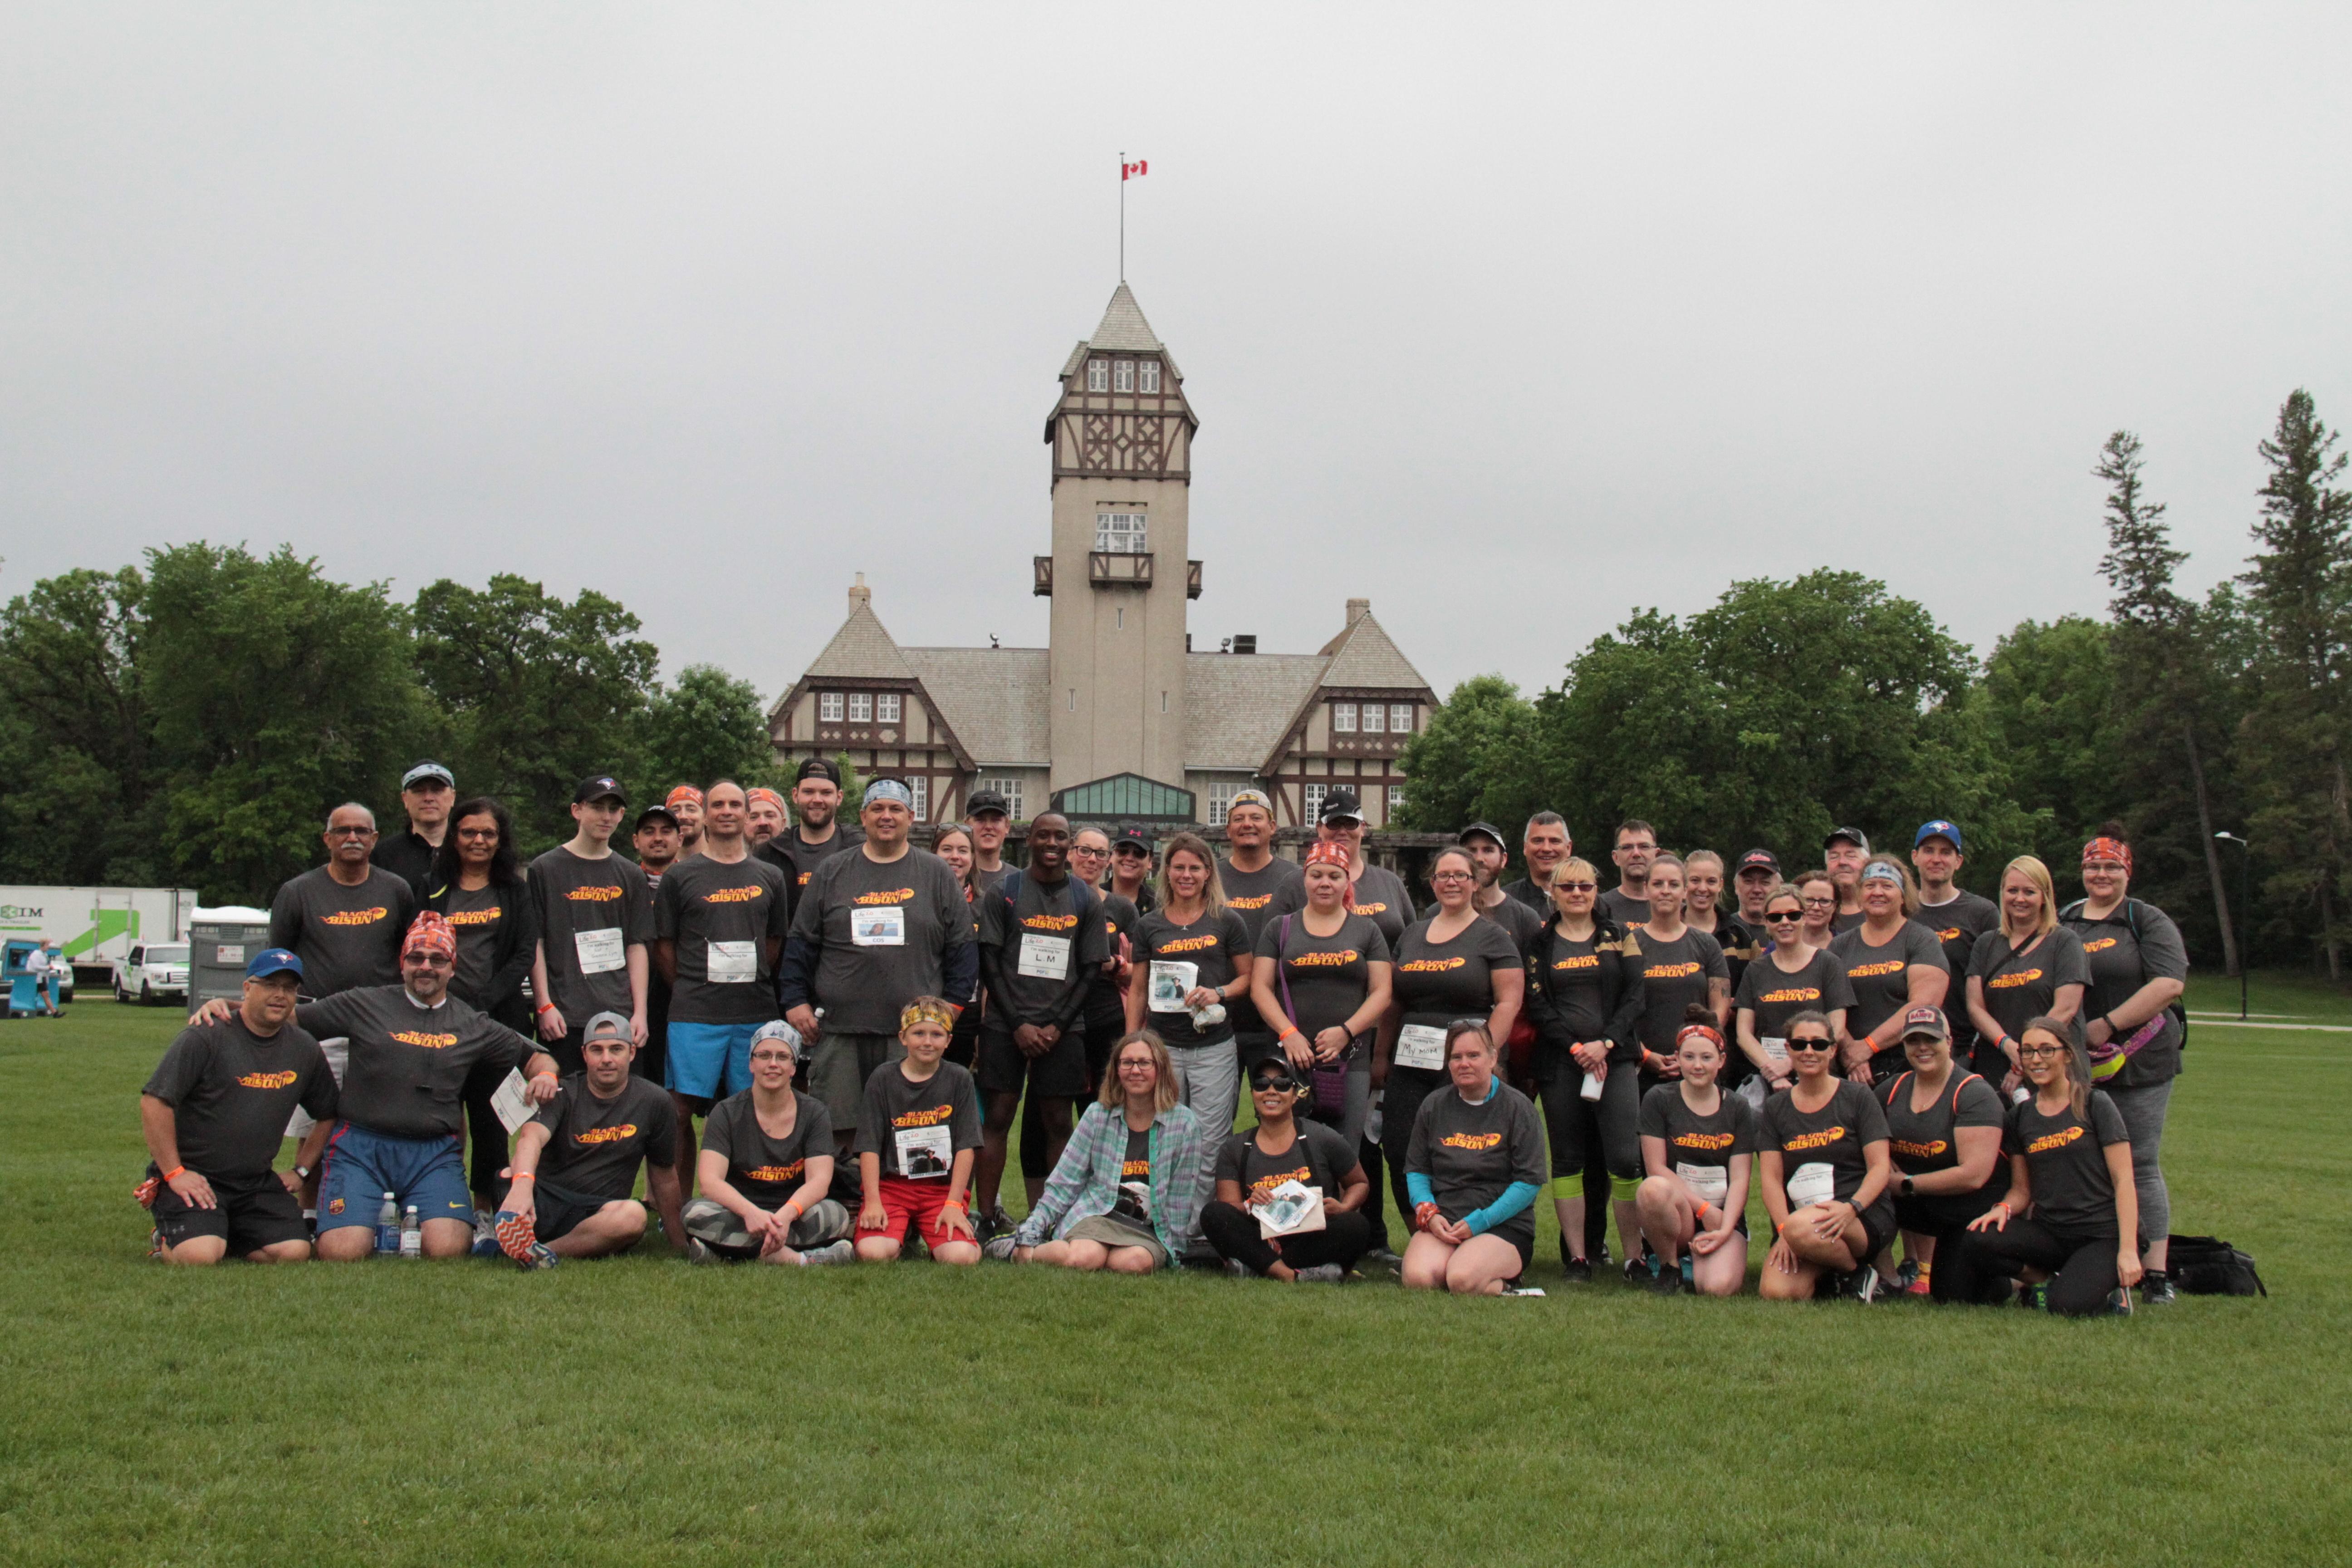 2018JUN_Challenge for Life Walk_Winnipeg (5)